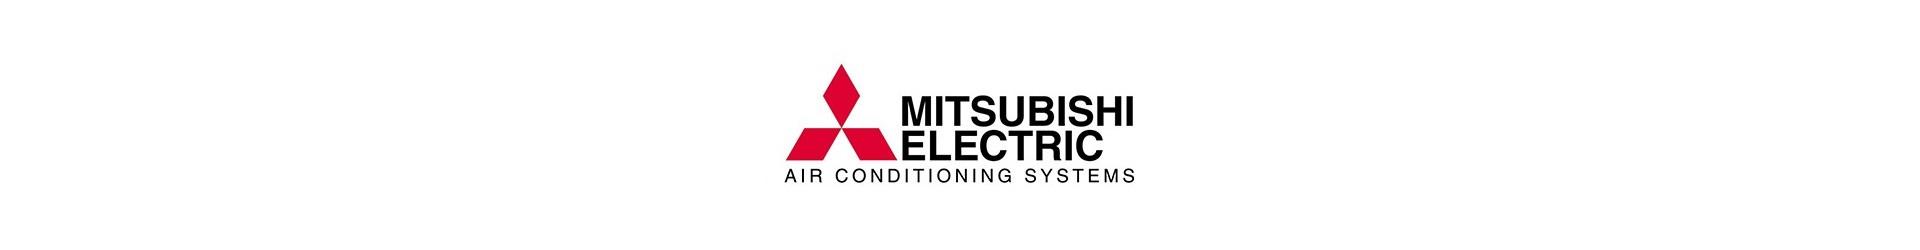 Mitsubishi Electric (Gewerbliche)